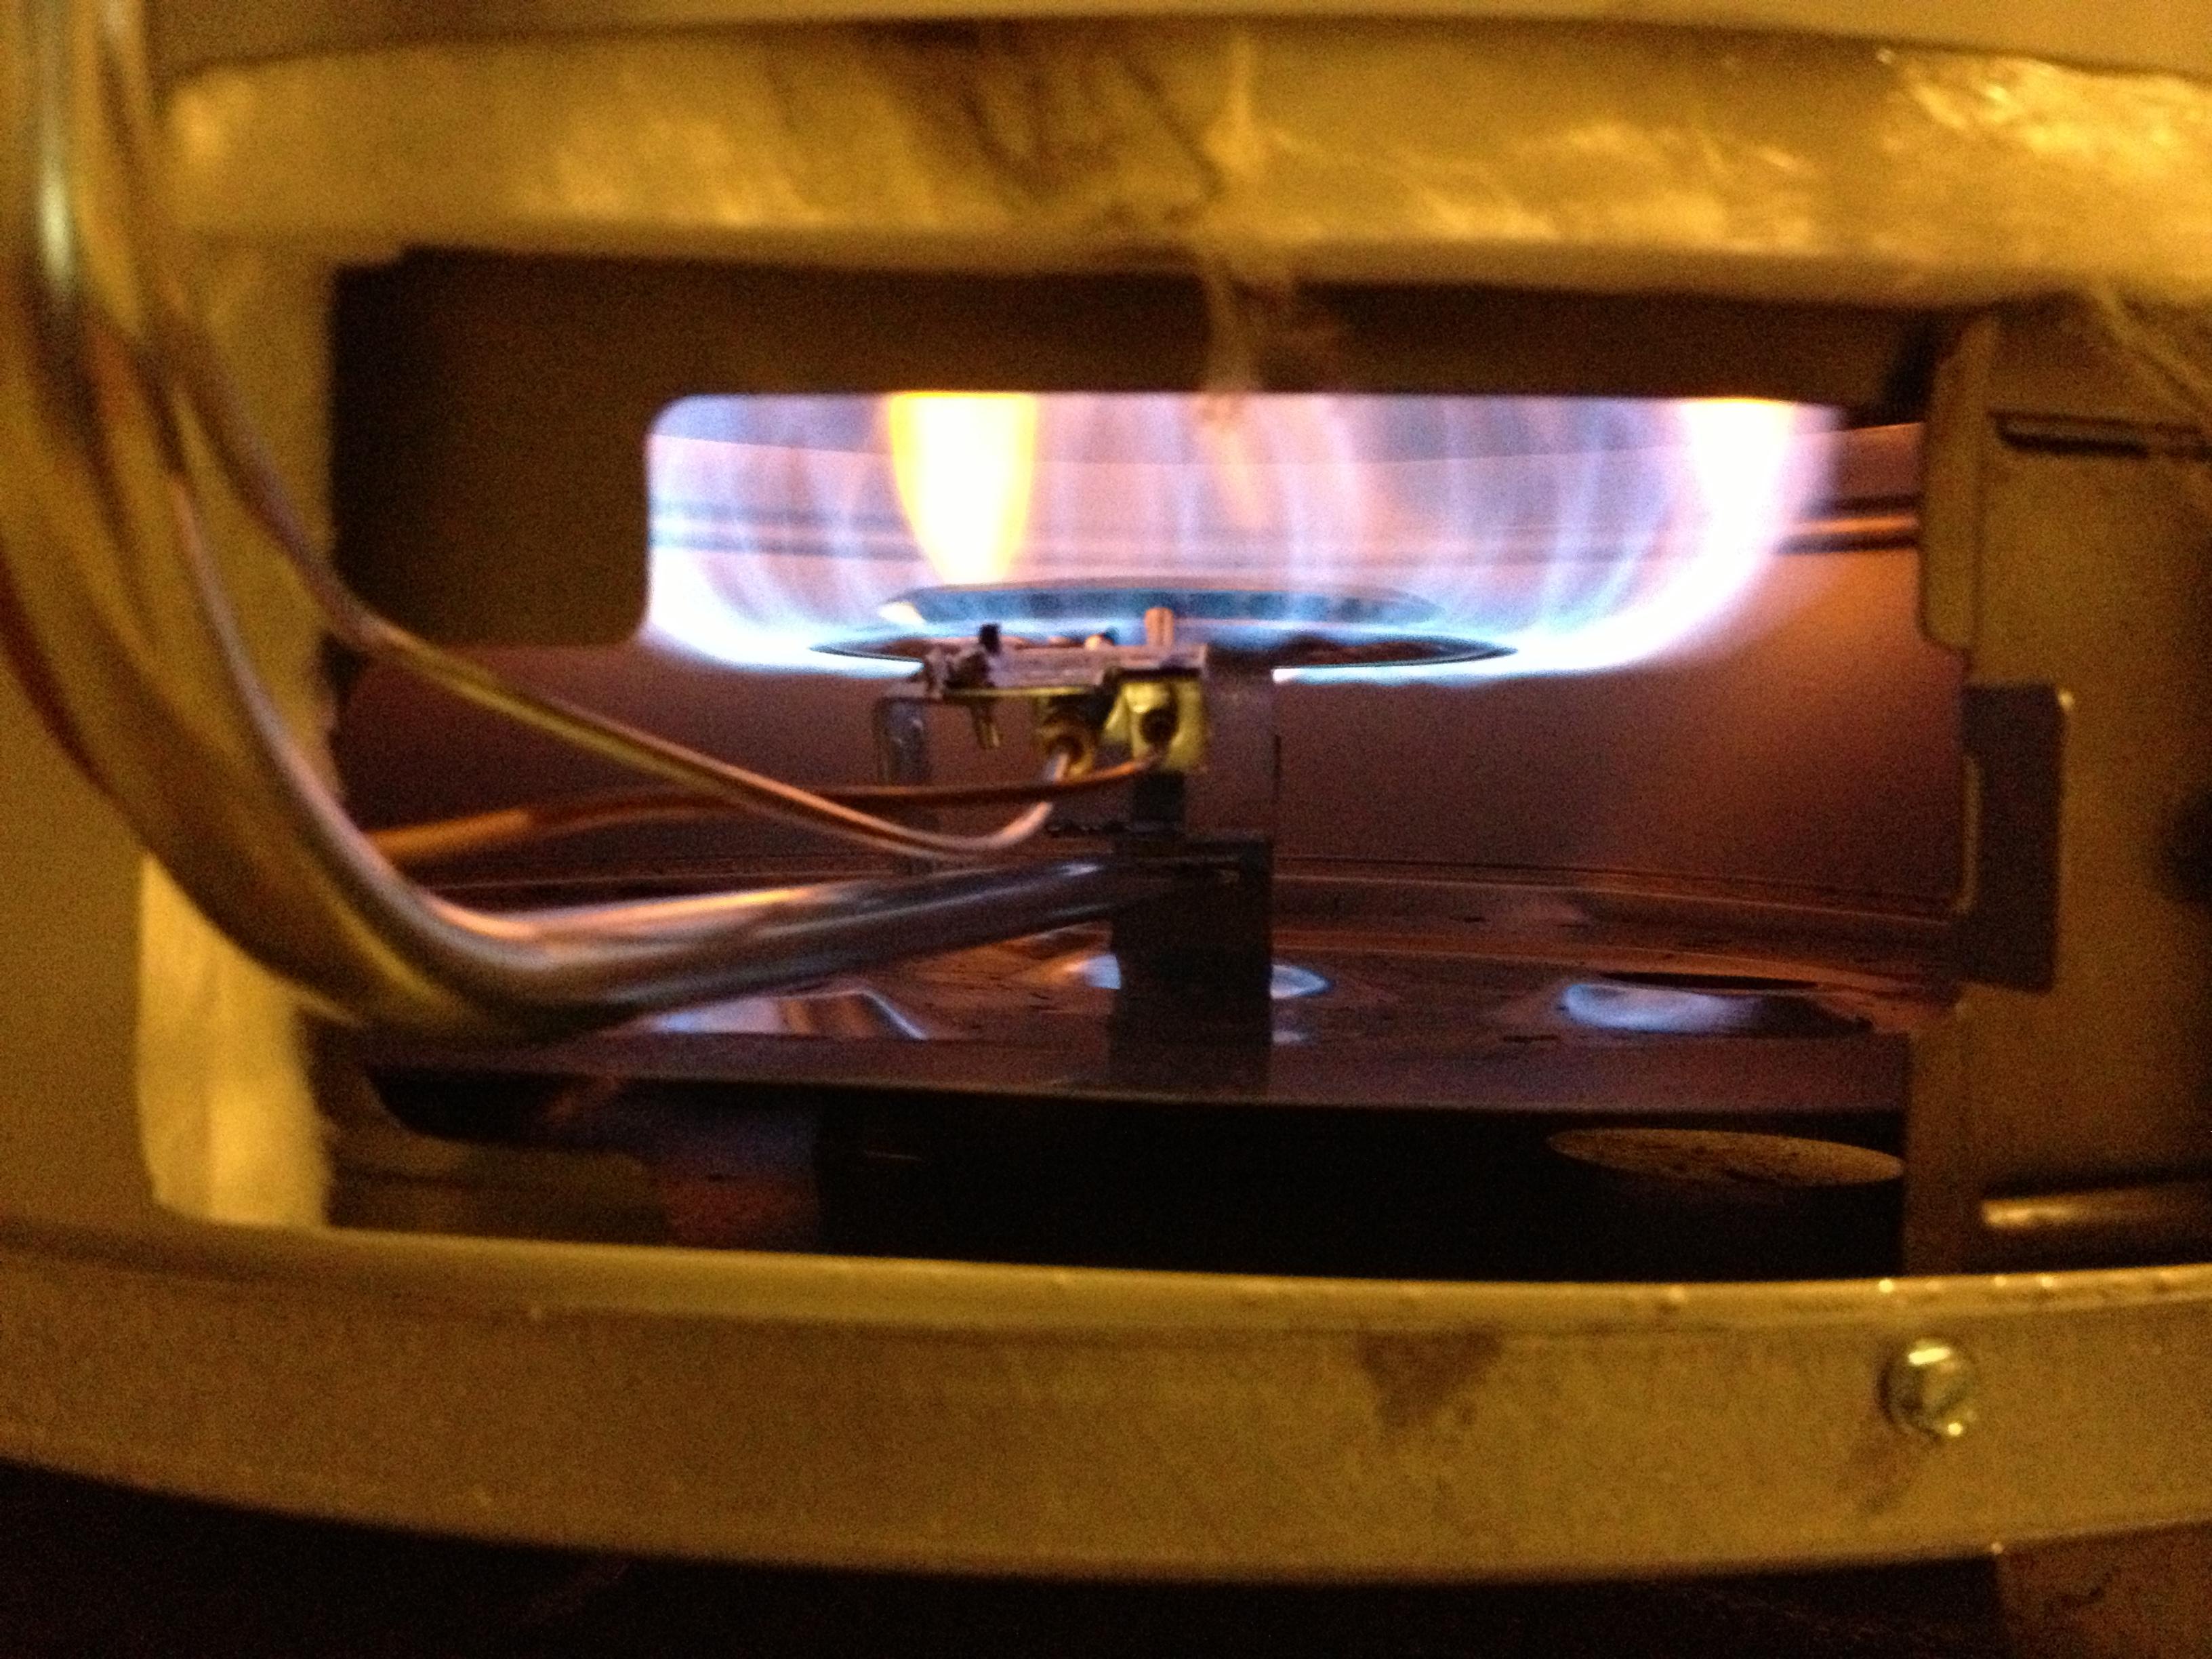 Trouble Lighting Pilot Light Water Heater